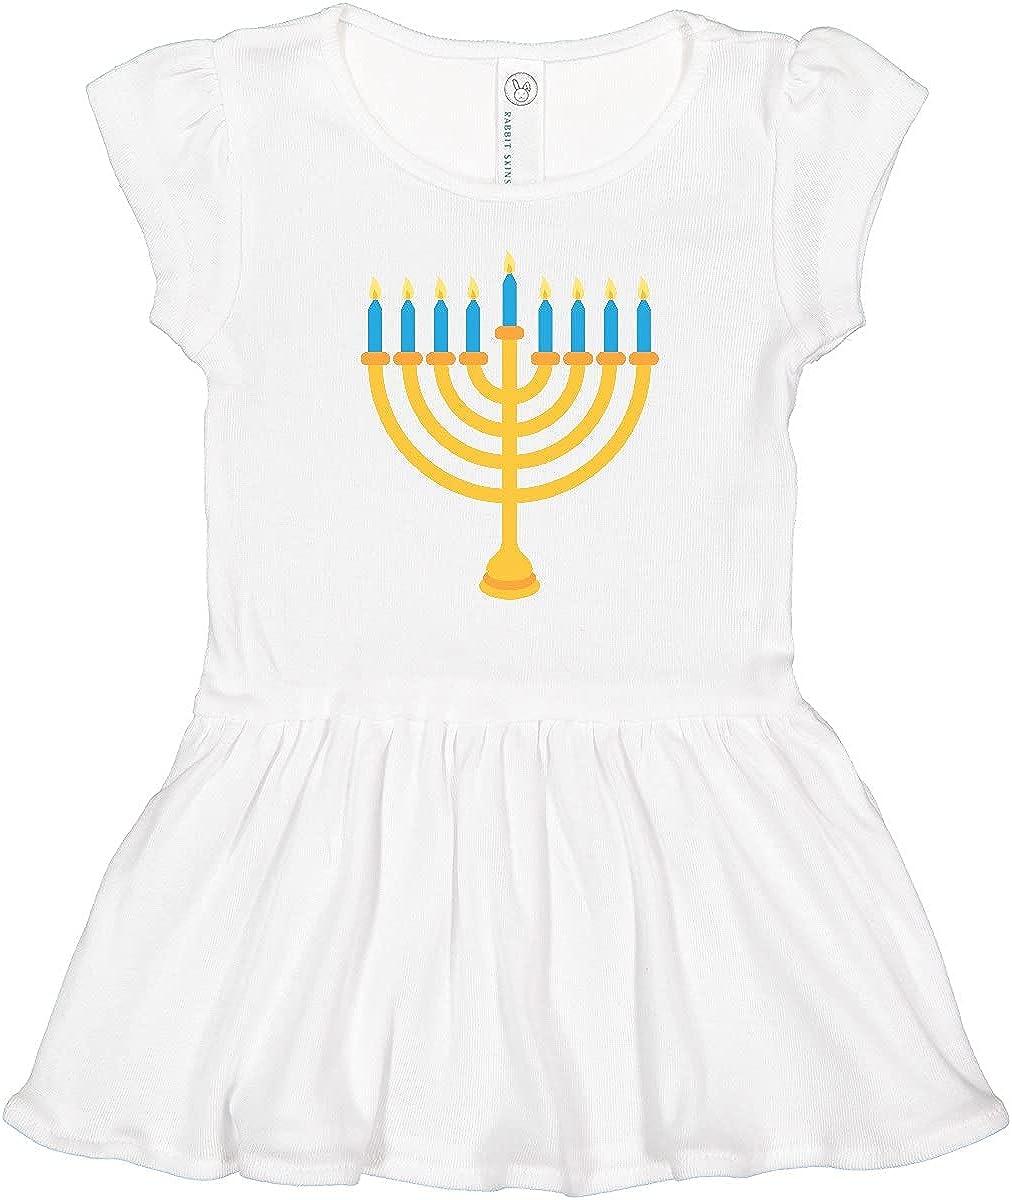 inktastic Hanukkah Chanukah Toddler Outlet ☆ Free Shipping Dress OFFer Menorah